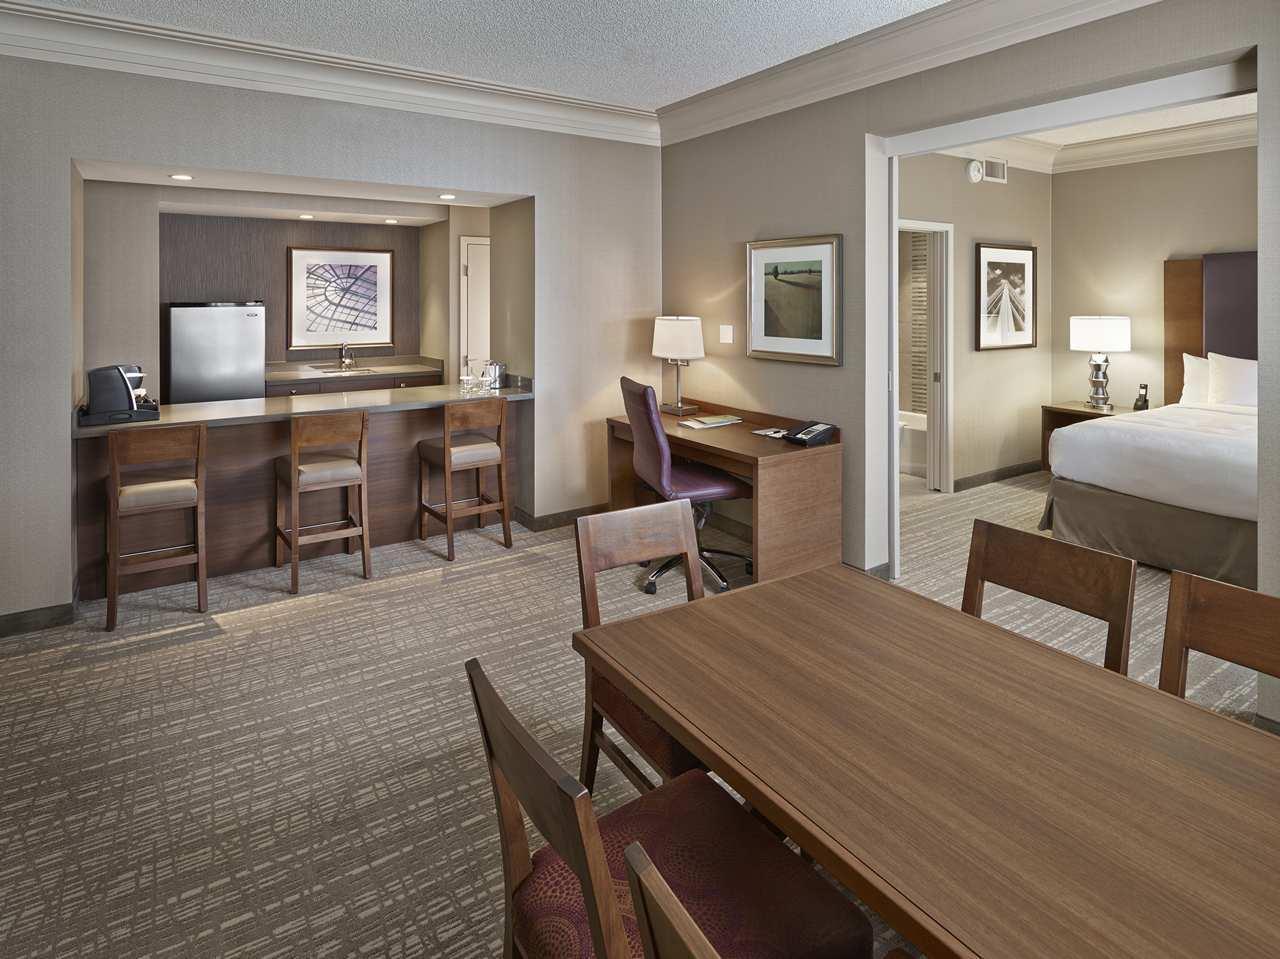 DoubleTree by Hilton Hotel West Edmonton in Edmonton: King Hospitality Suite Work Space and Breakfast Bar